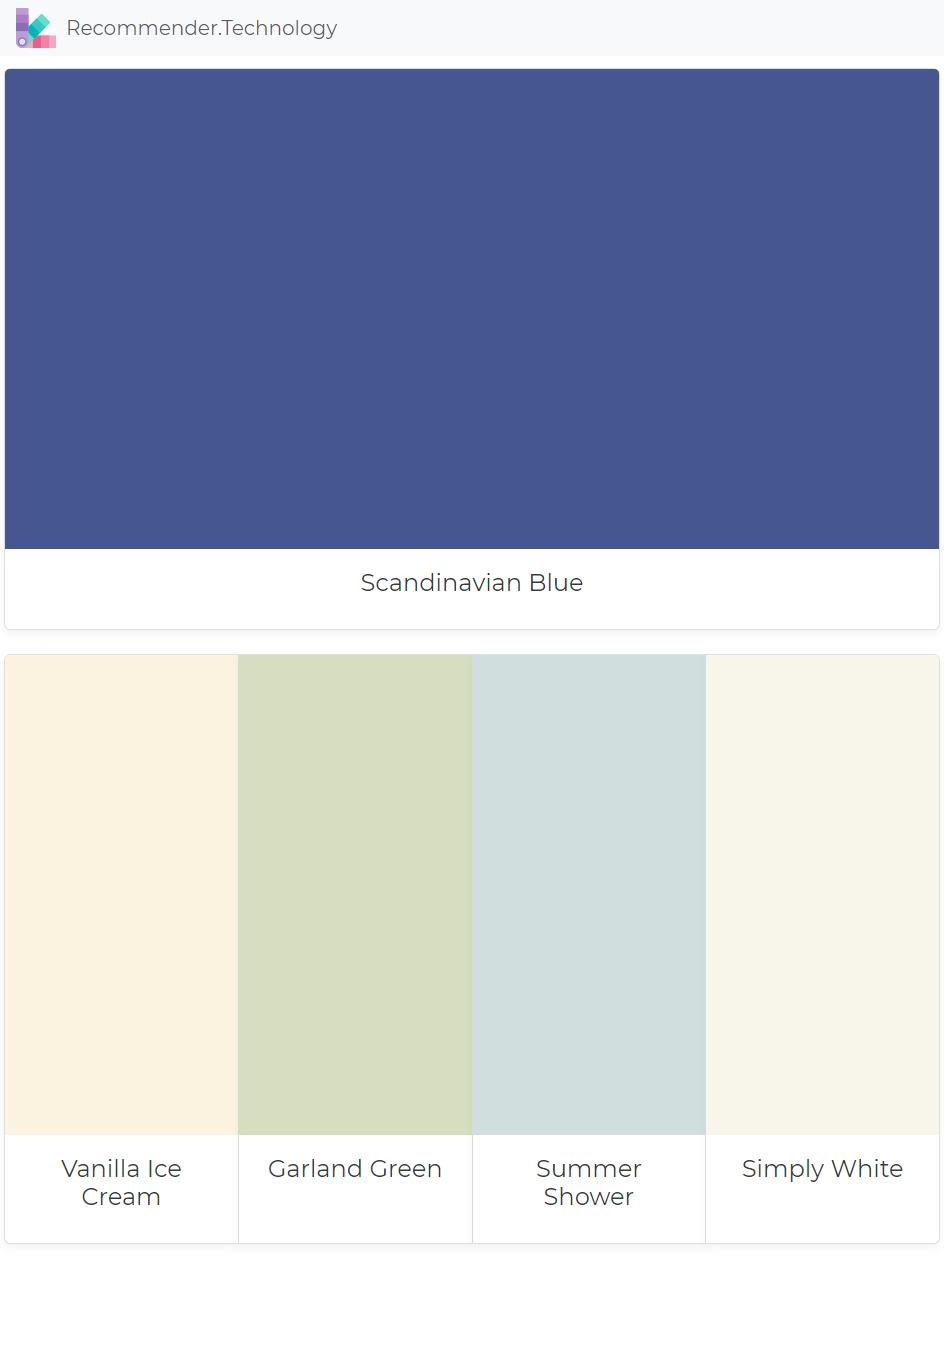 Scandinavian Blue Vanilla Ice Cream Garland Green Summer Shower Simply White Paint Colors Benjamin Moore Perfect Paint Color Paint Color Palettes